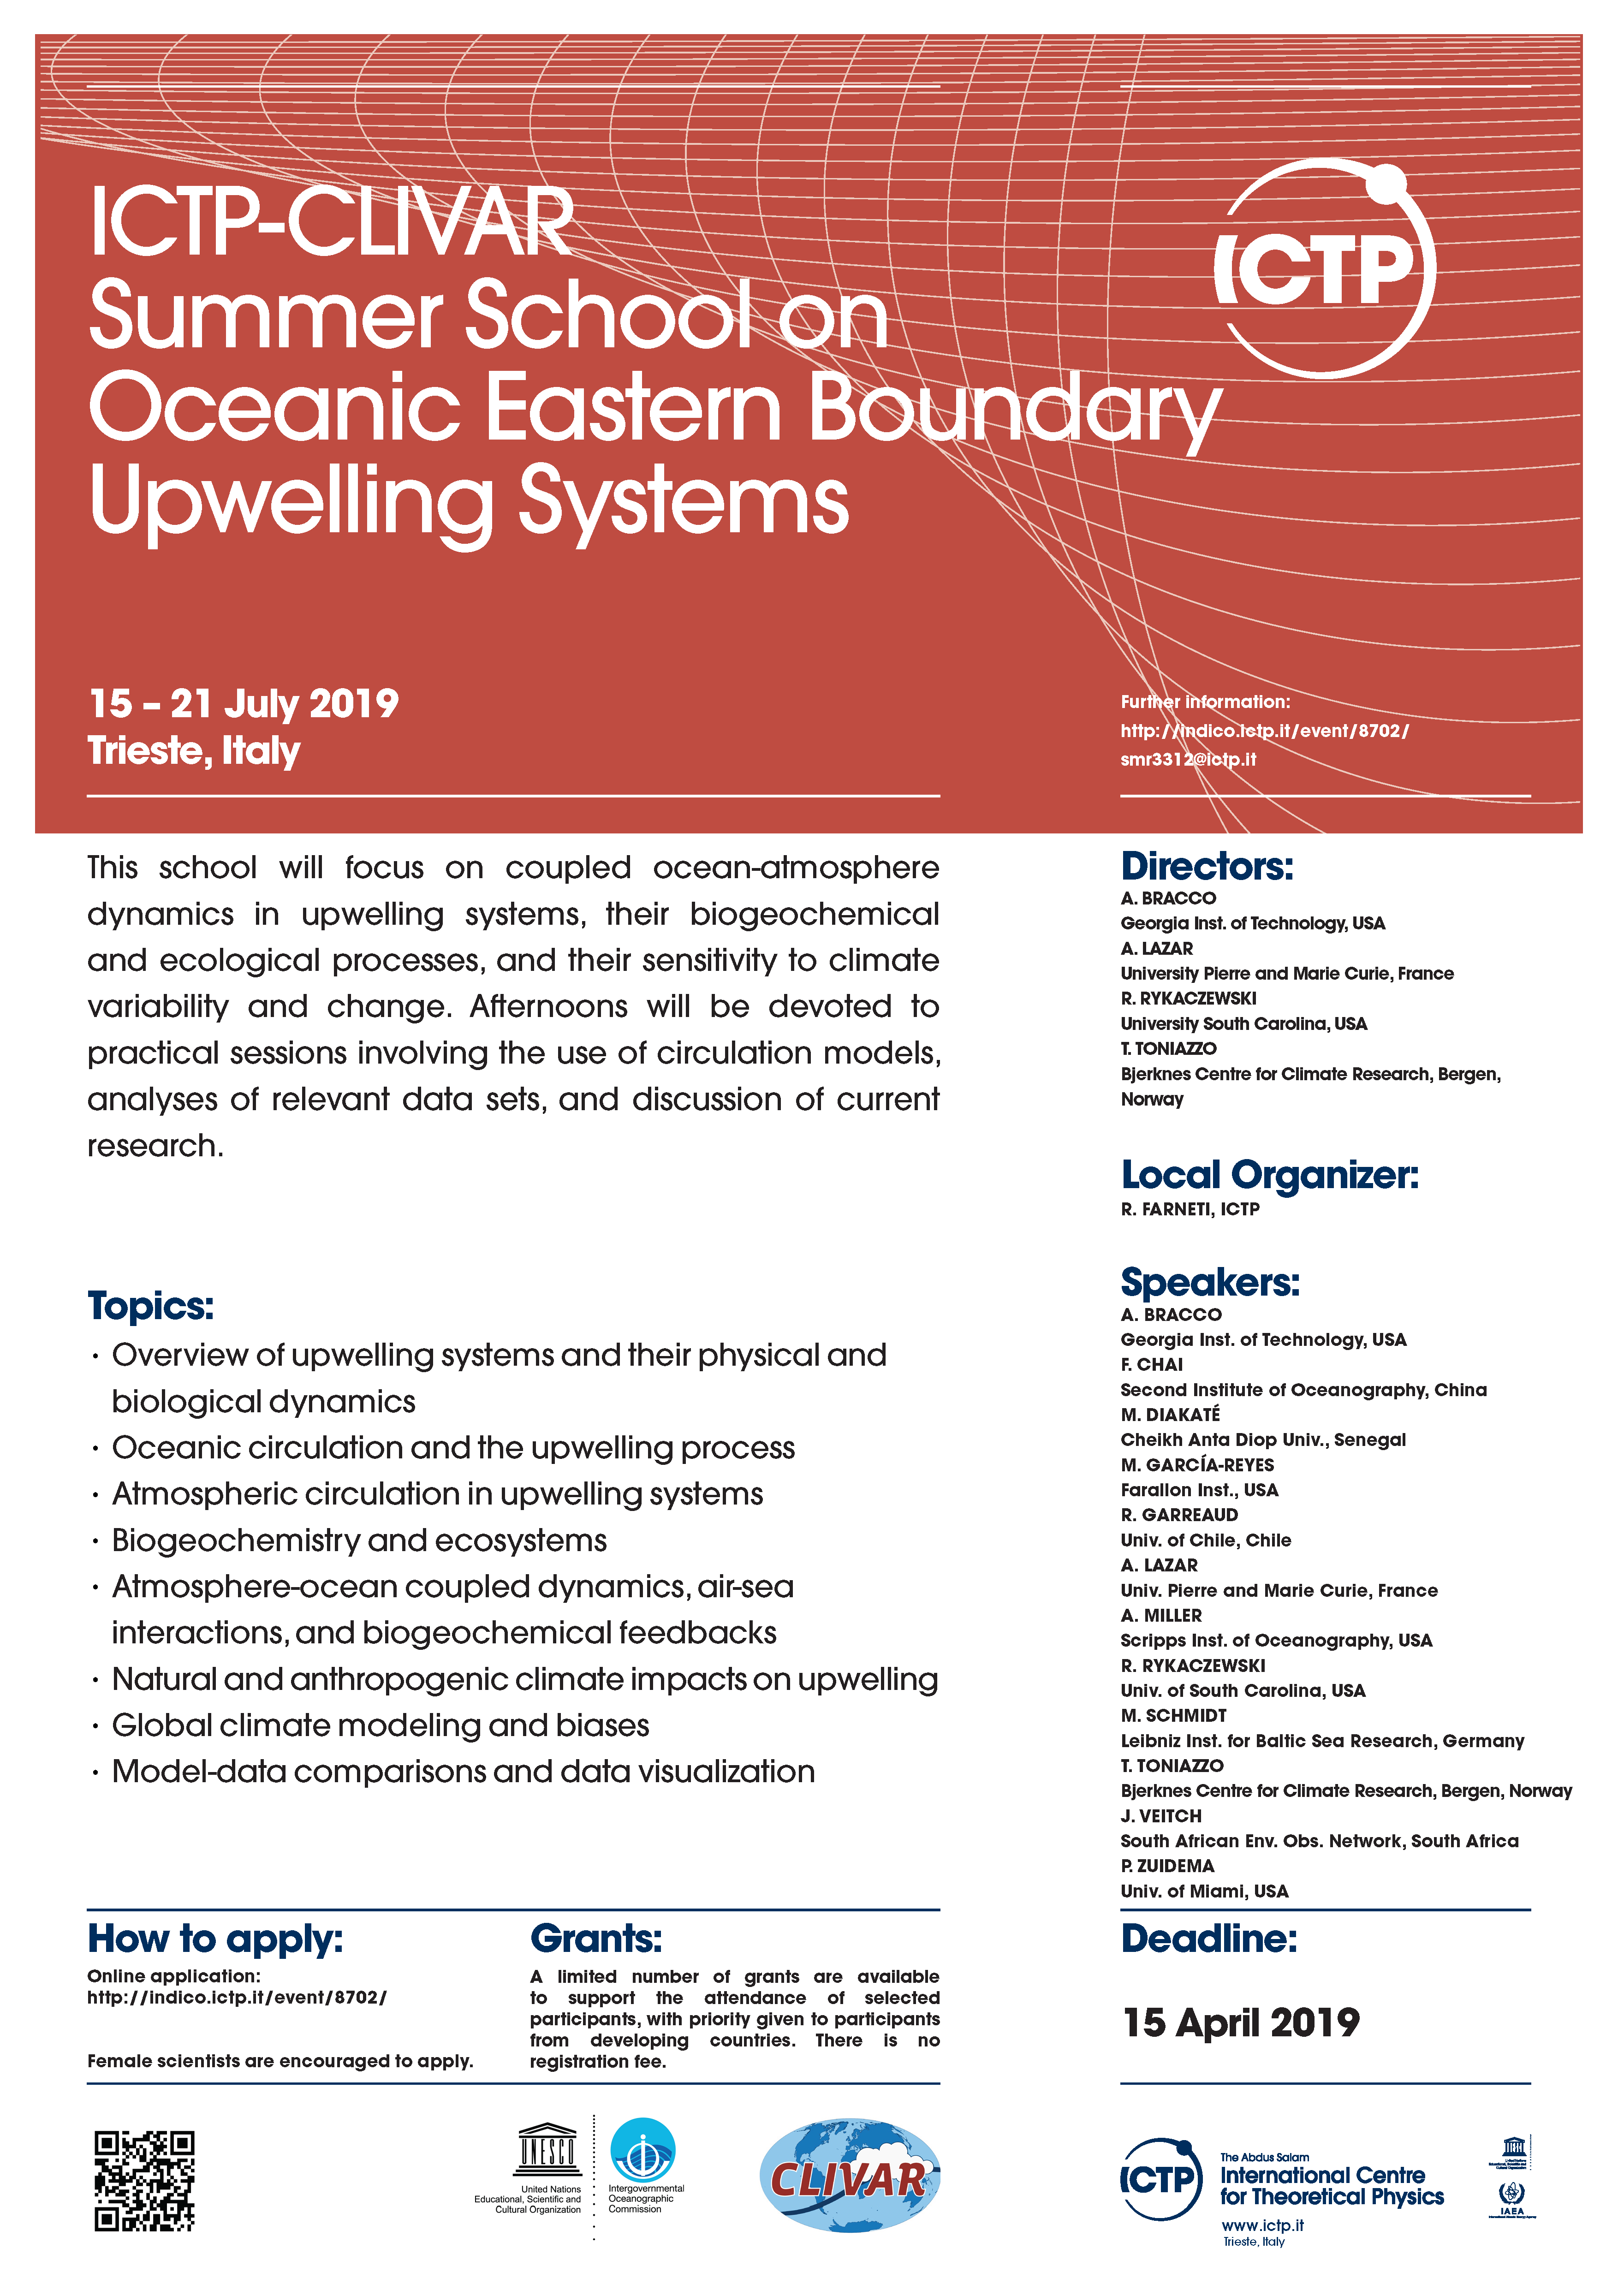 Rykaczewski Lab - Ecosystem Oceanography and Climate Change